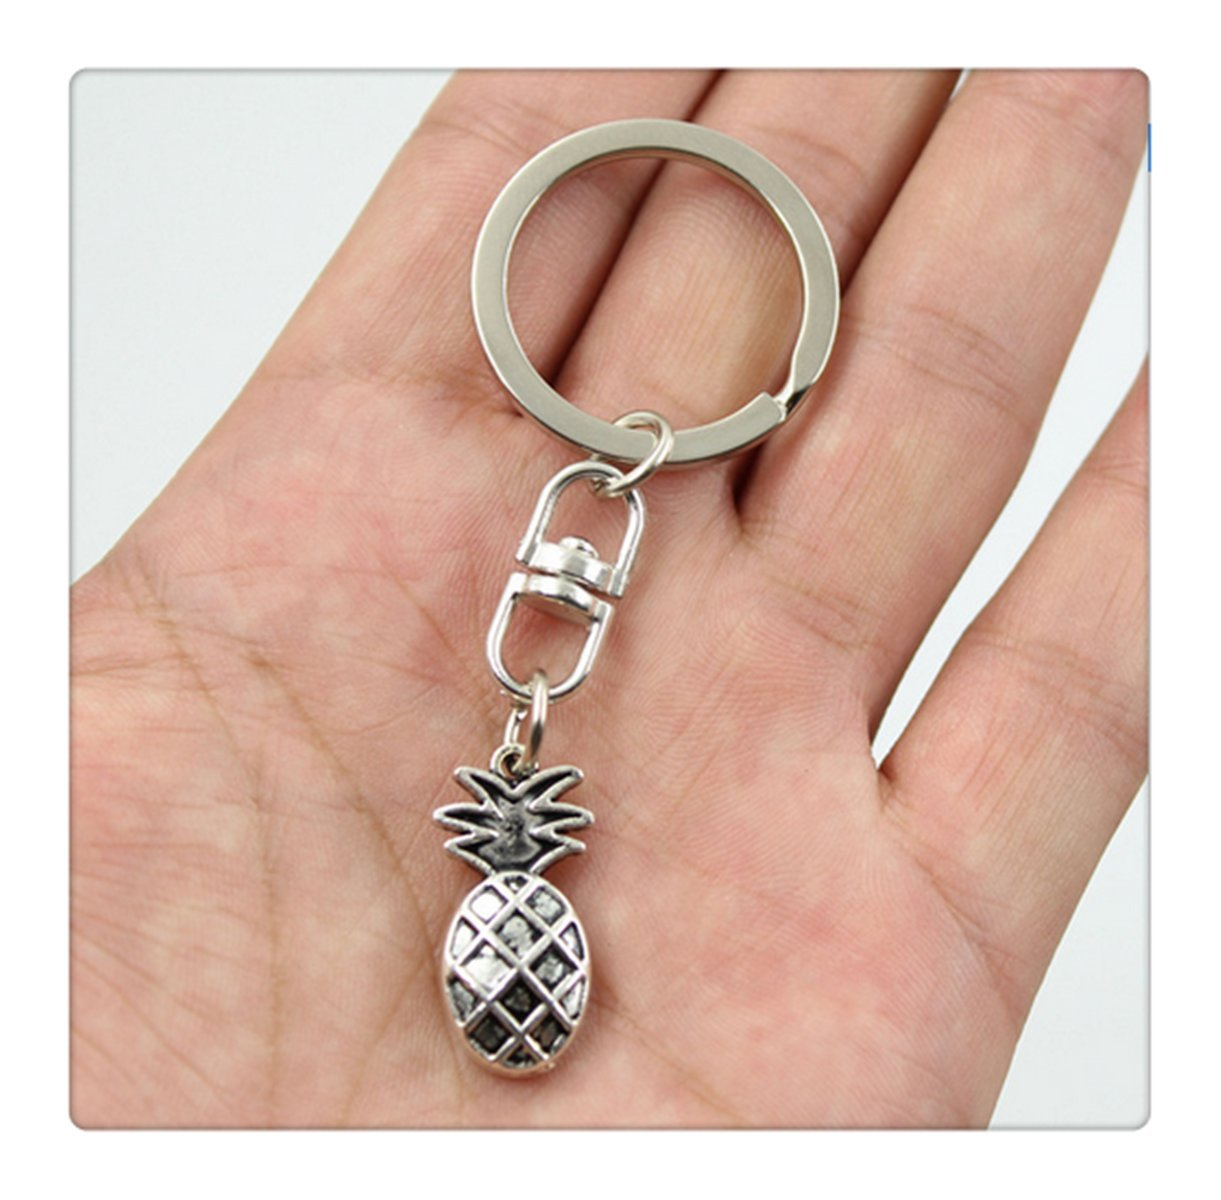 Vintage donkey Key Rings Fashion Car Keychain Silver Color Metal Key Chains Accessory